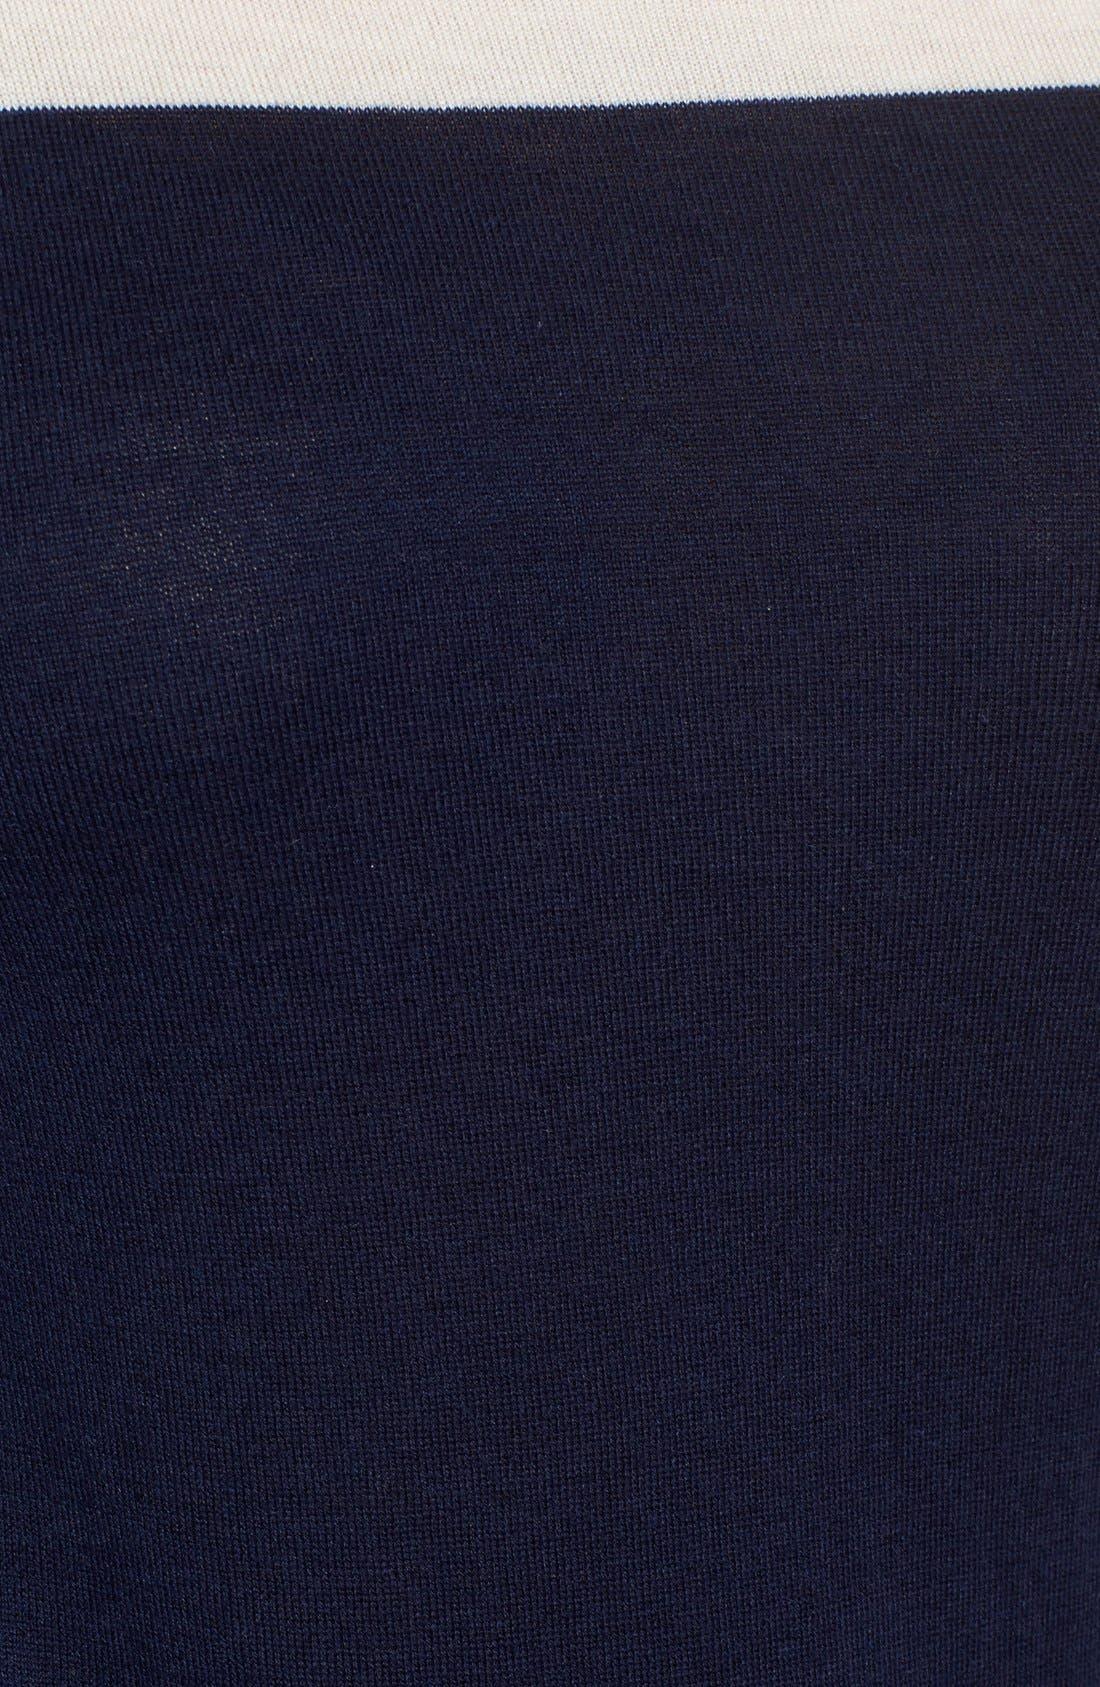 Cotton Blend Pullover,                             Alternate thumbnail 170, color,